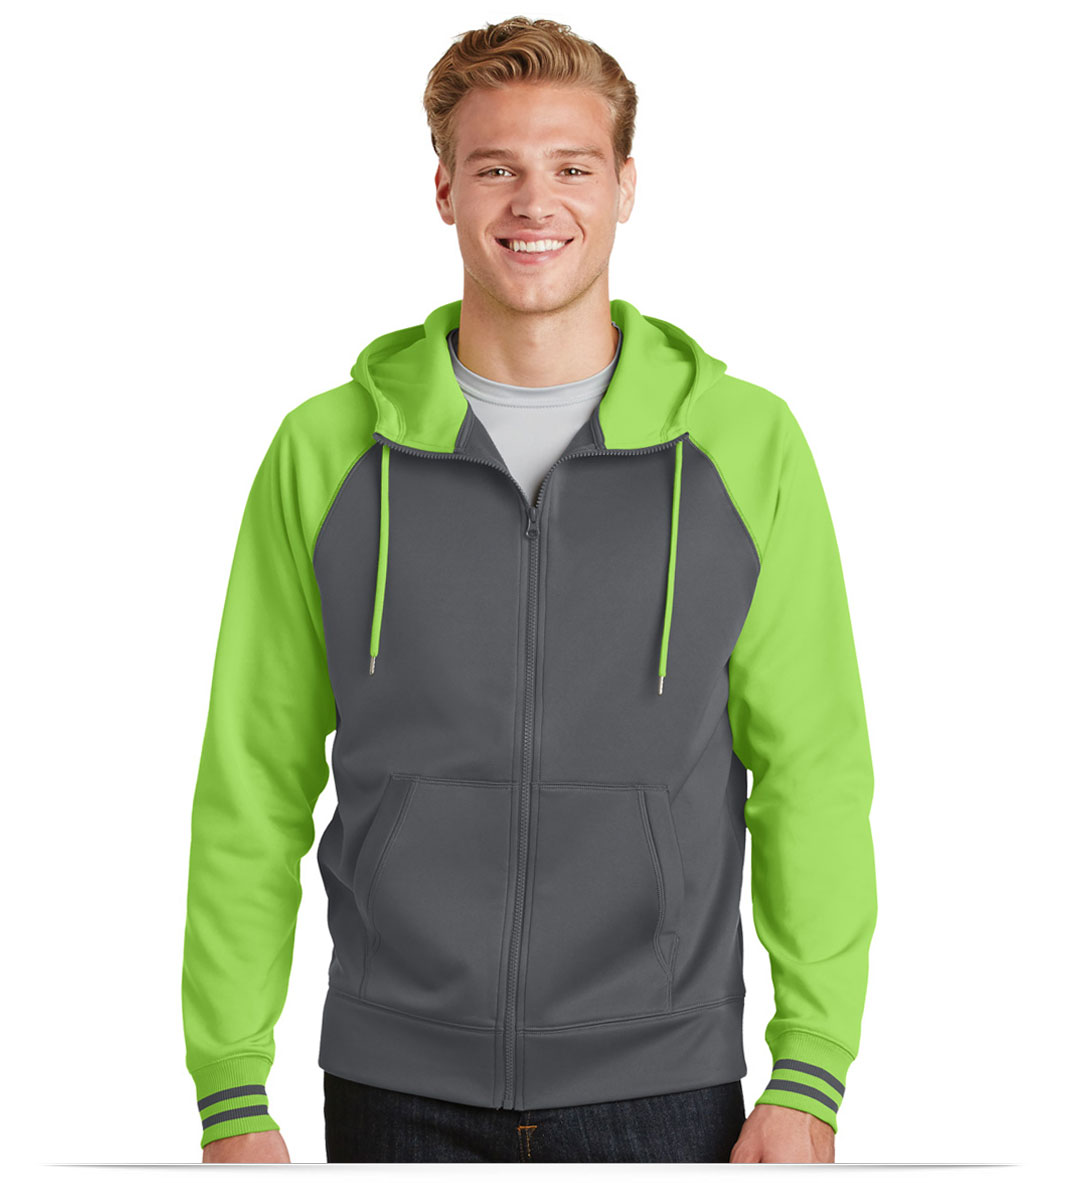 Personalized Sport-Tek Varsity Fleece Full-Zip Hooded Jacket